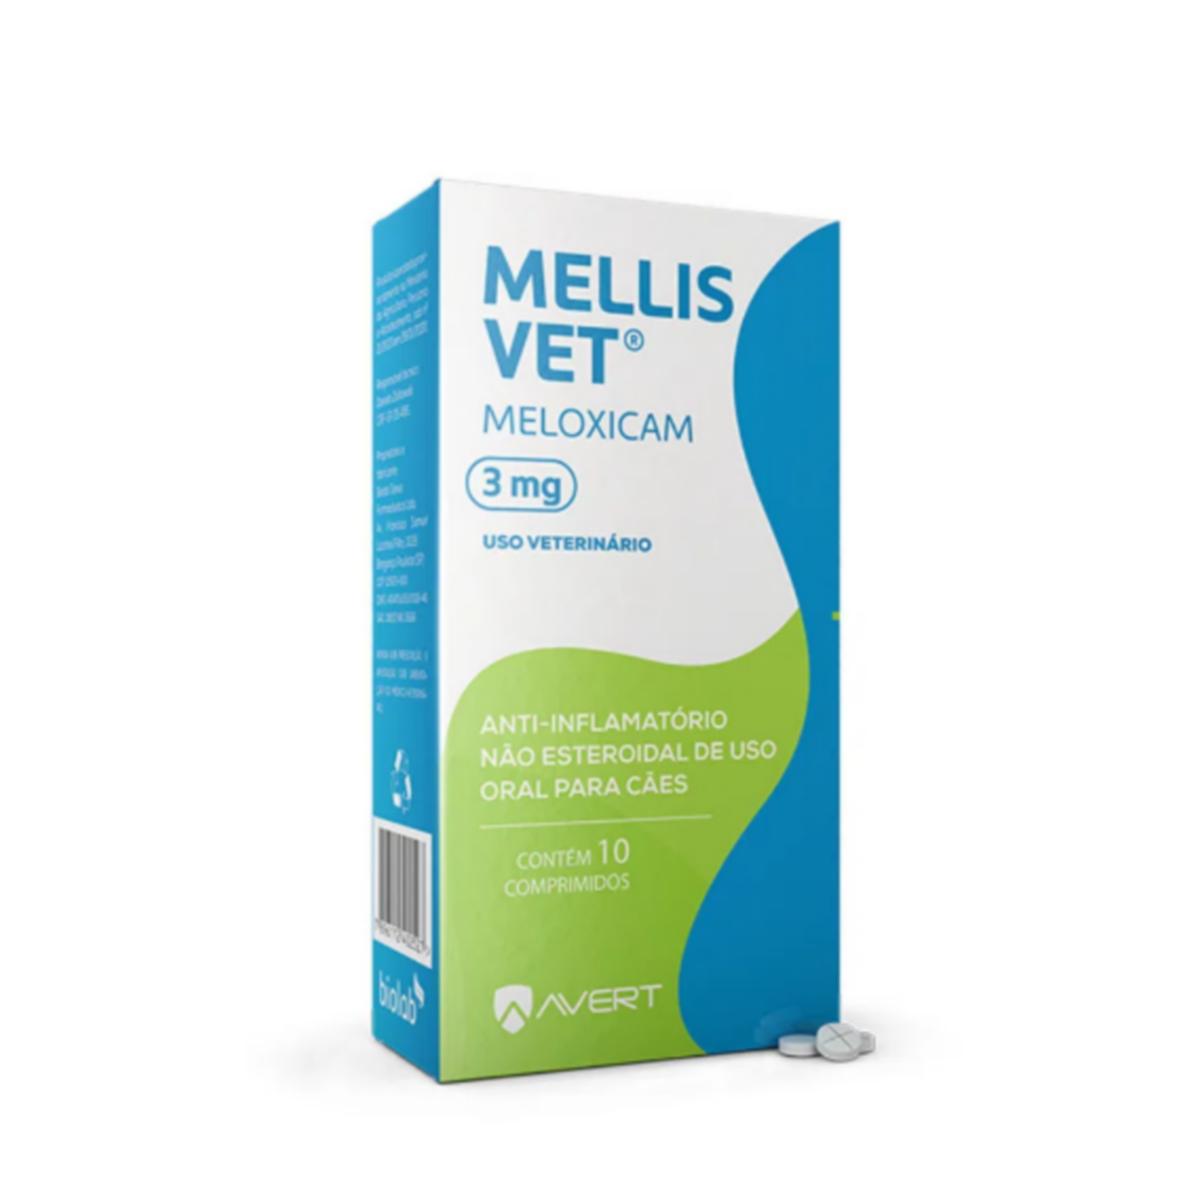 MELLIS VET 3MG 10 COMP